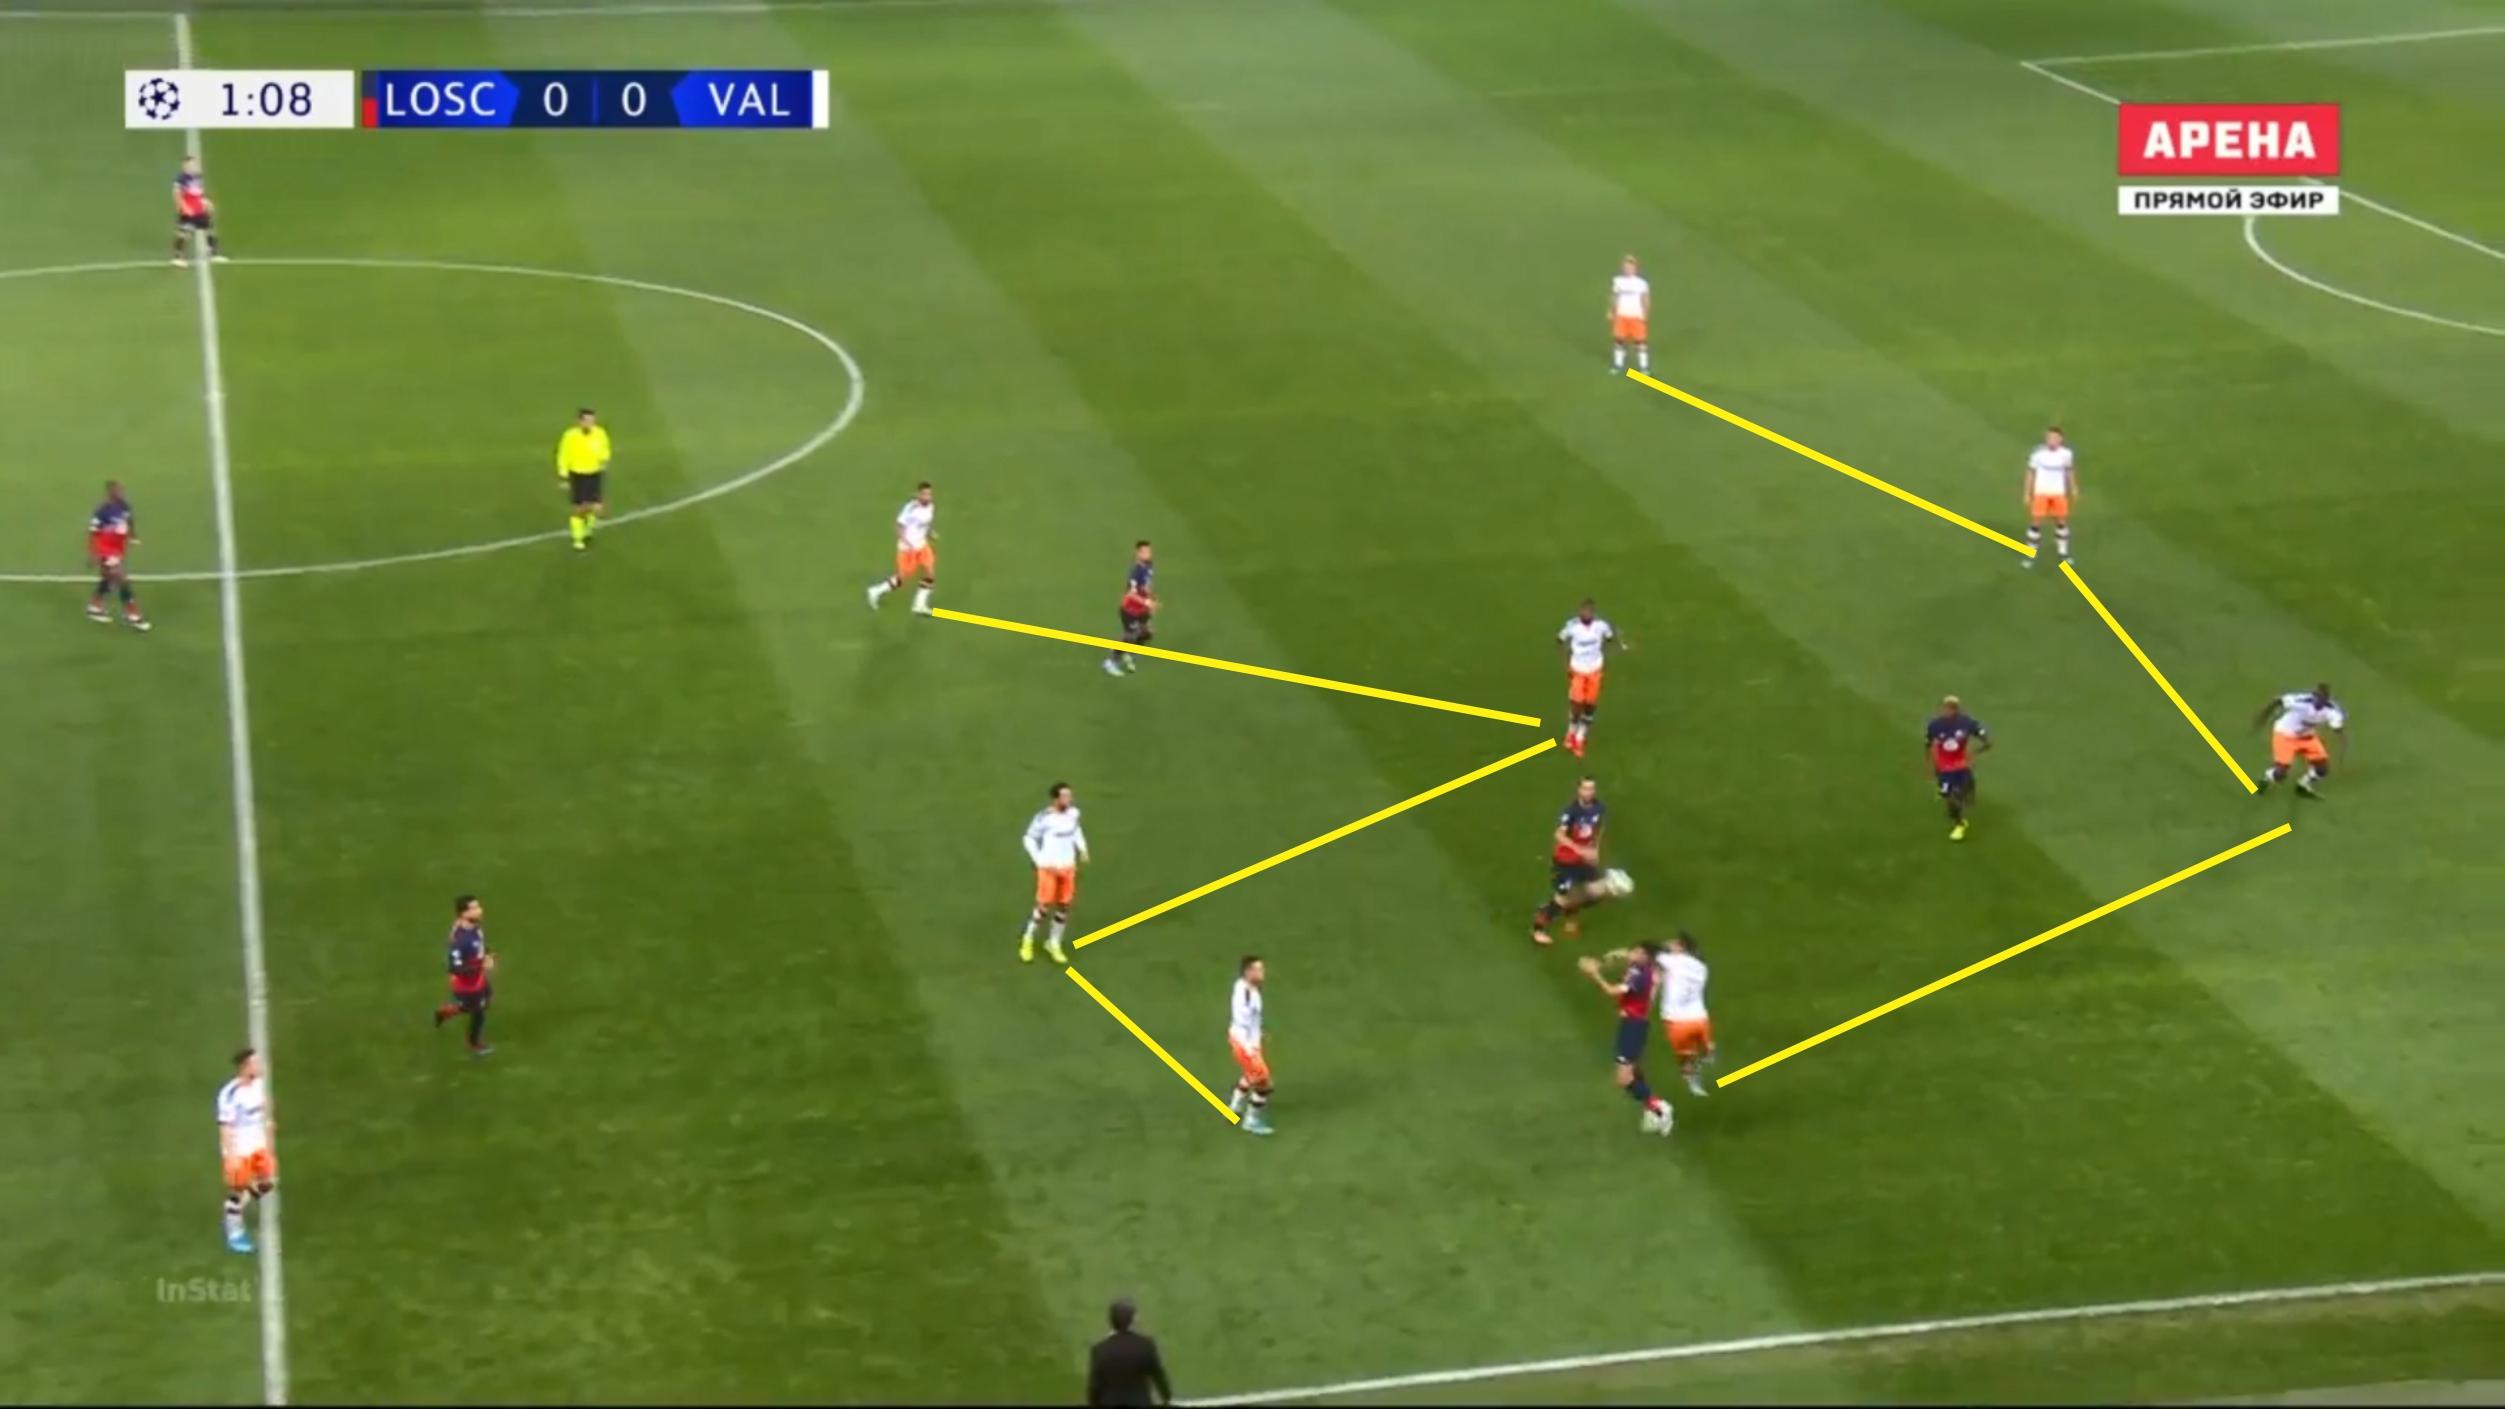 UEFA Champions League 2019/20: Lille vs Valencia - tactical analysis tactics